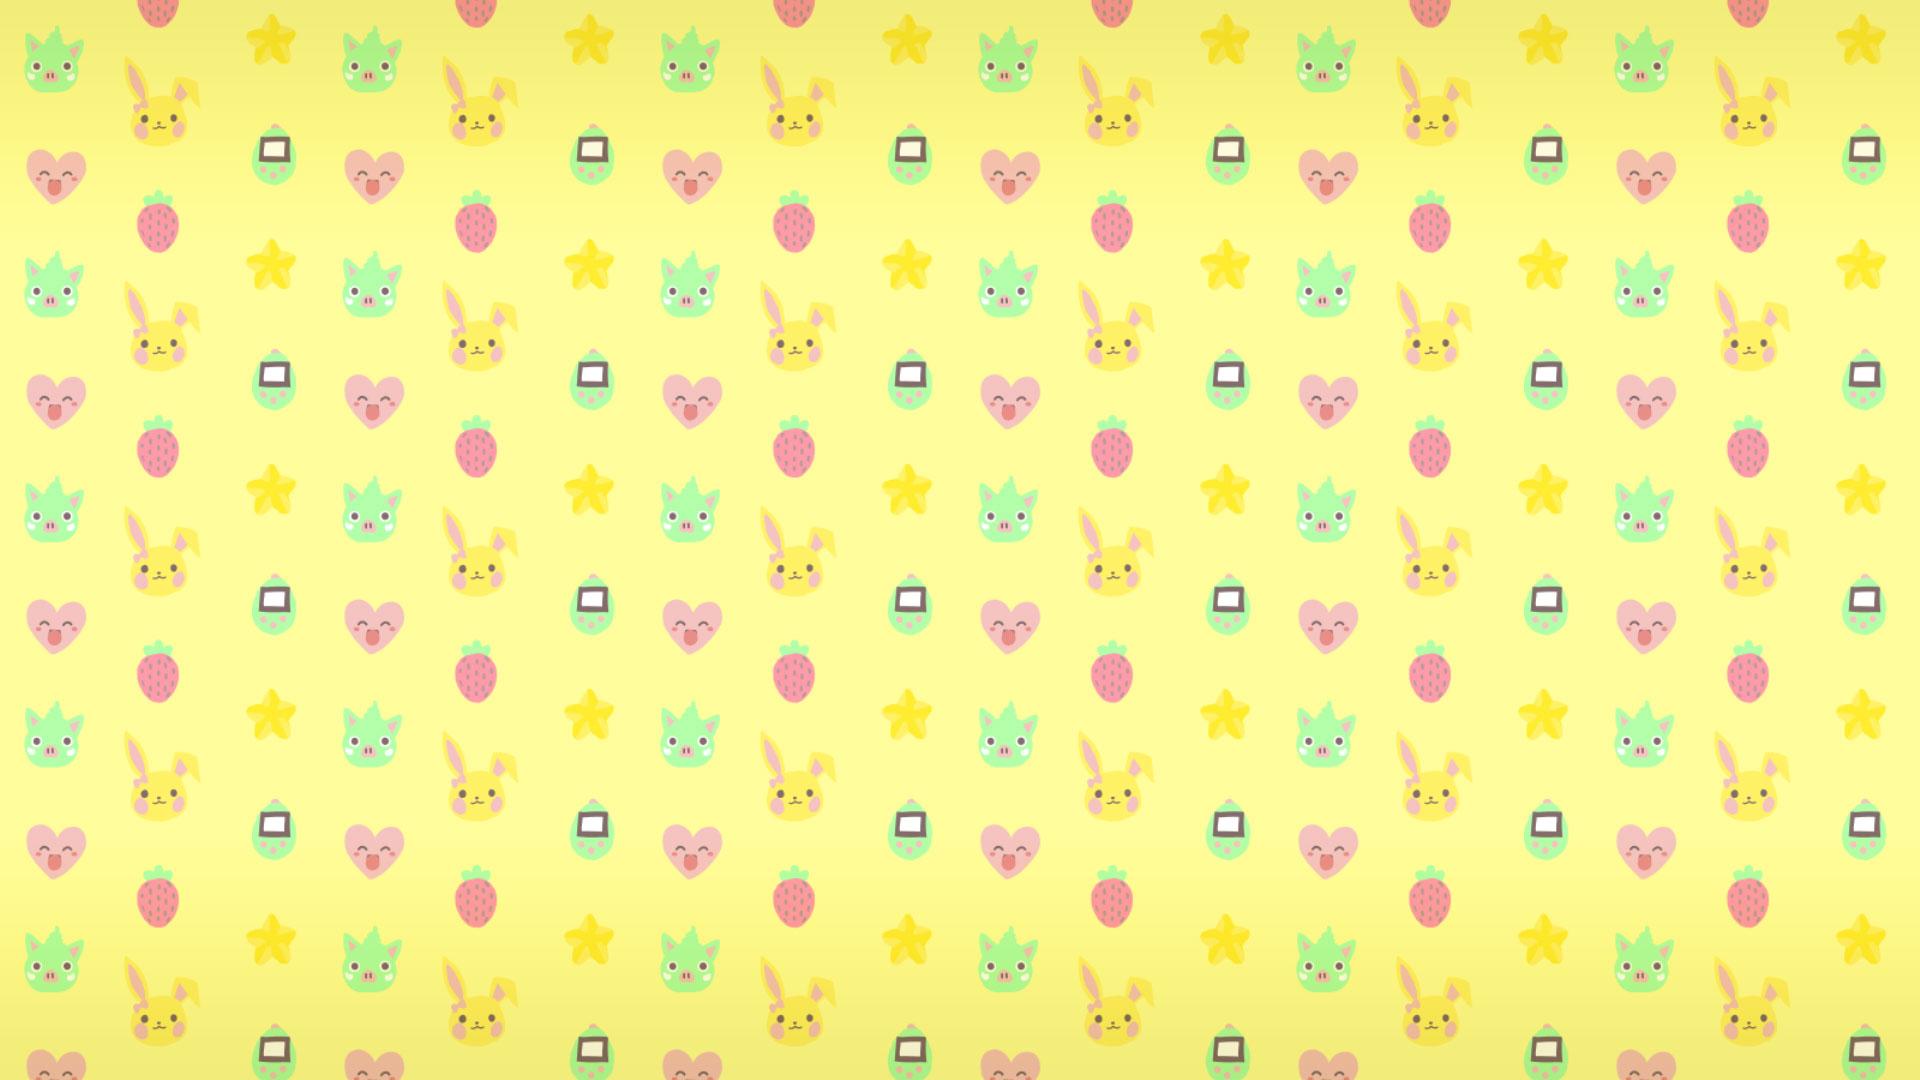 Smite Kawaii Pattern Wallpaper   Imgur 1920x1080